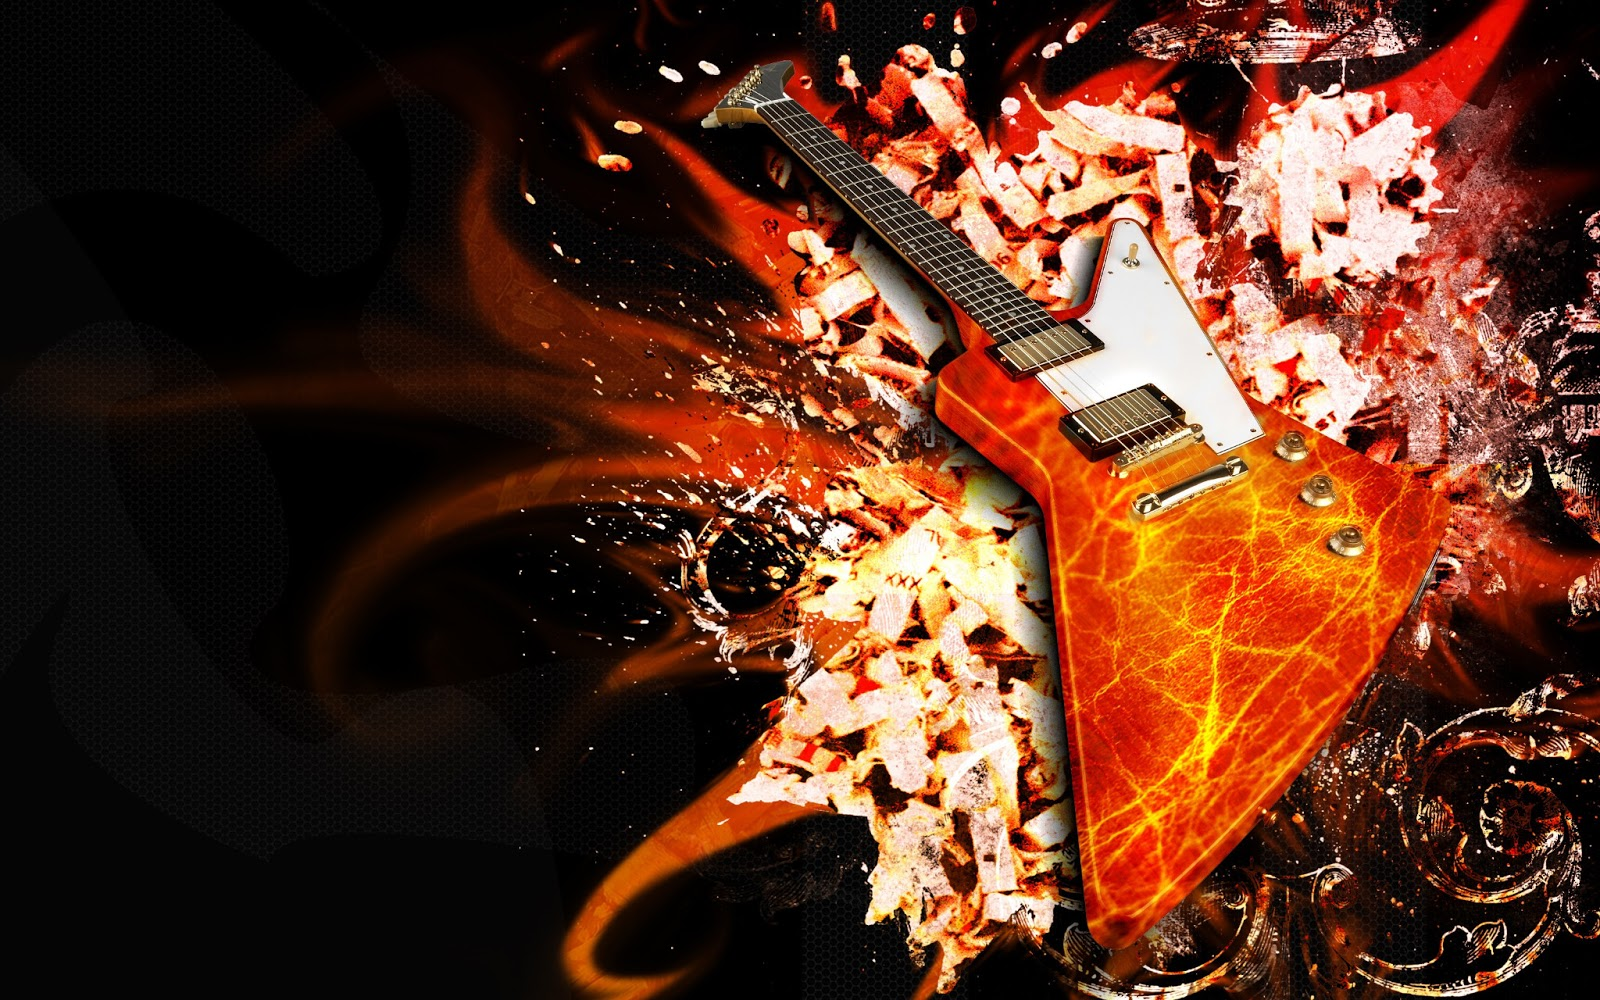 Guitar wallpaper collection desktop guitar wallpaper collection 12 - Free guitar wallpapers for pc ...